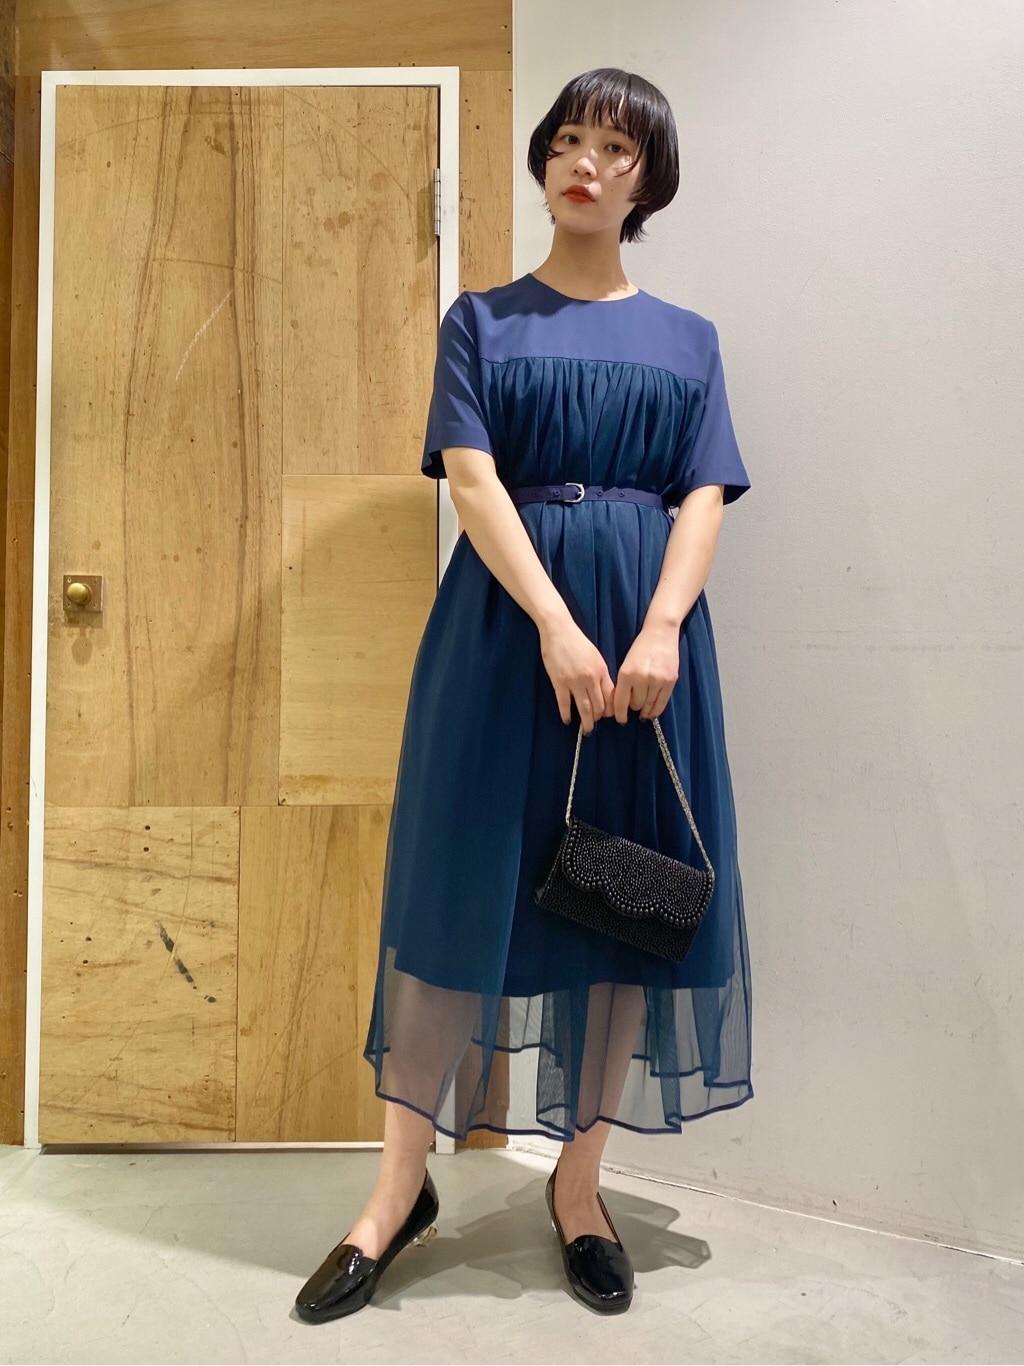 l'atelier du savon 新宿ミロード 身長:159cm 2020.12.11